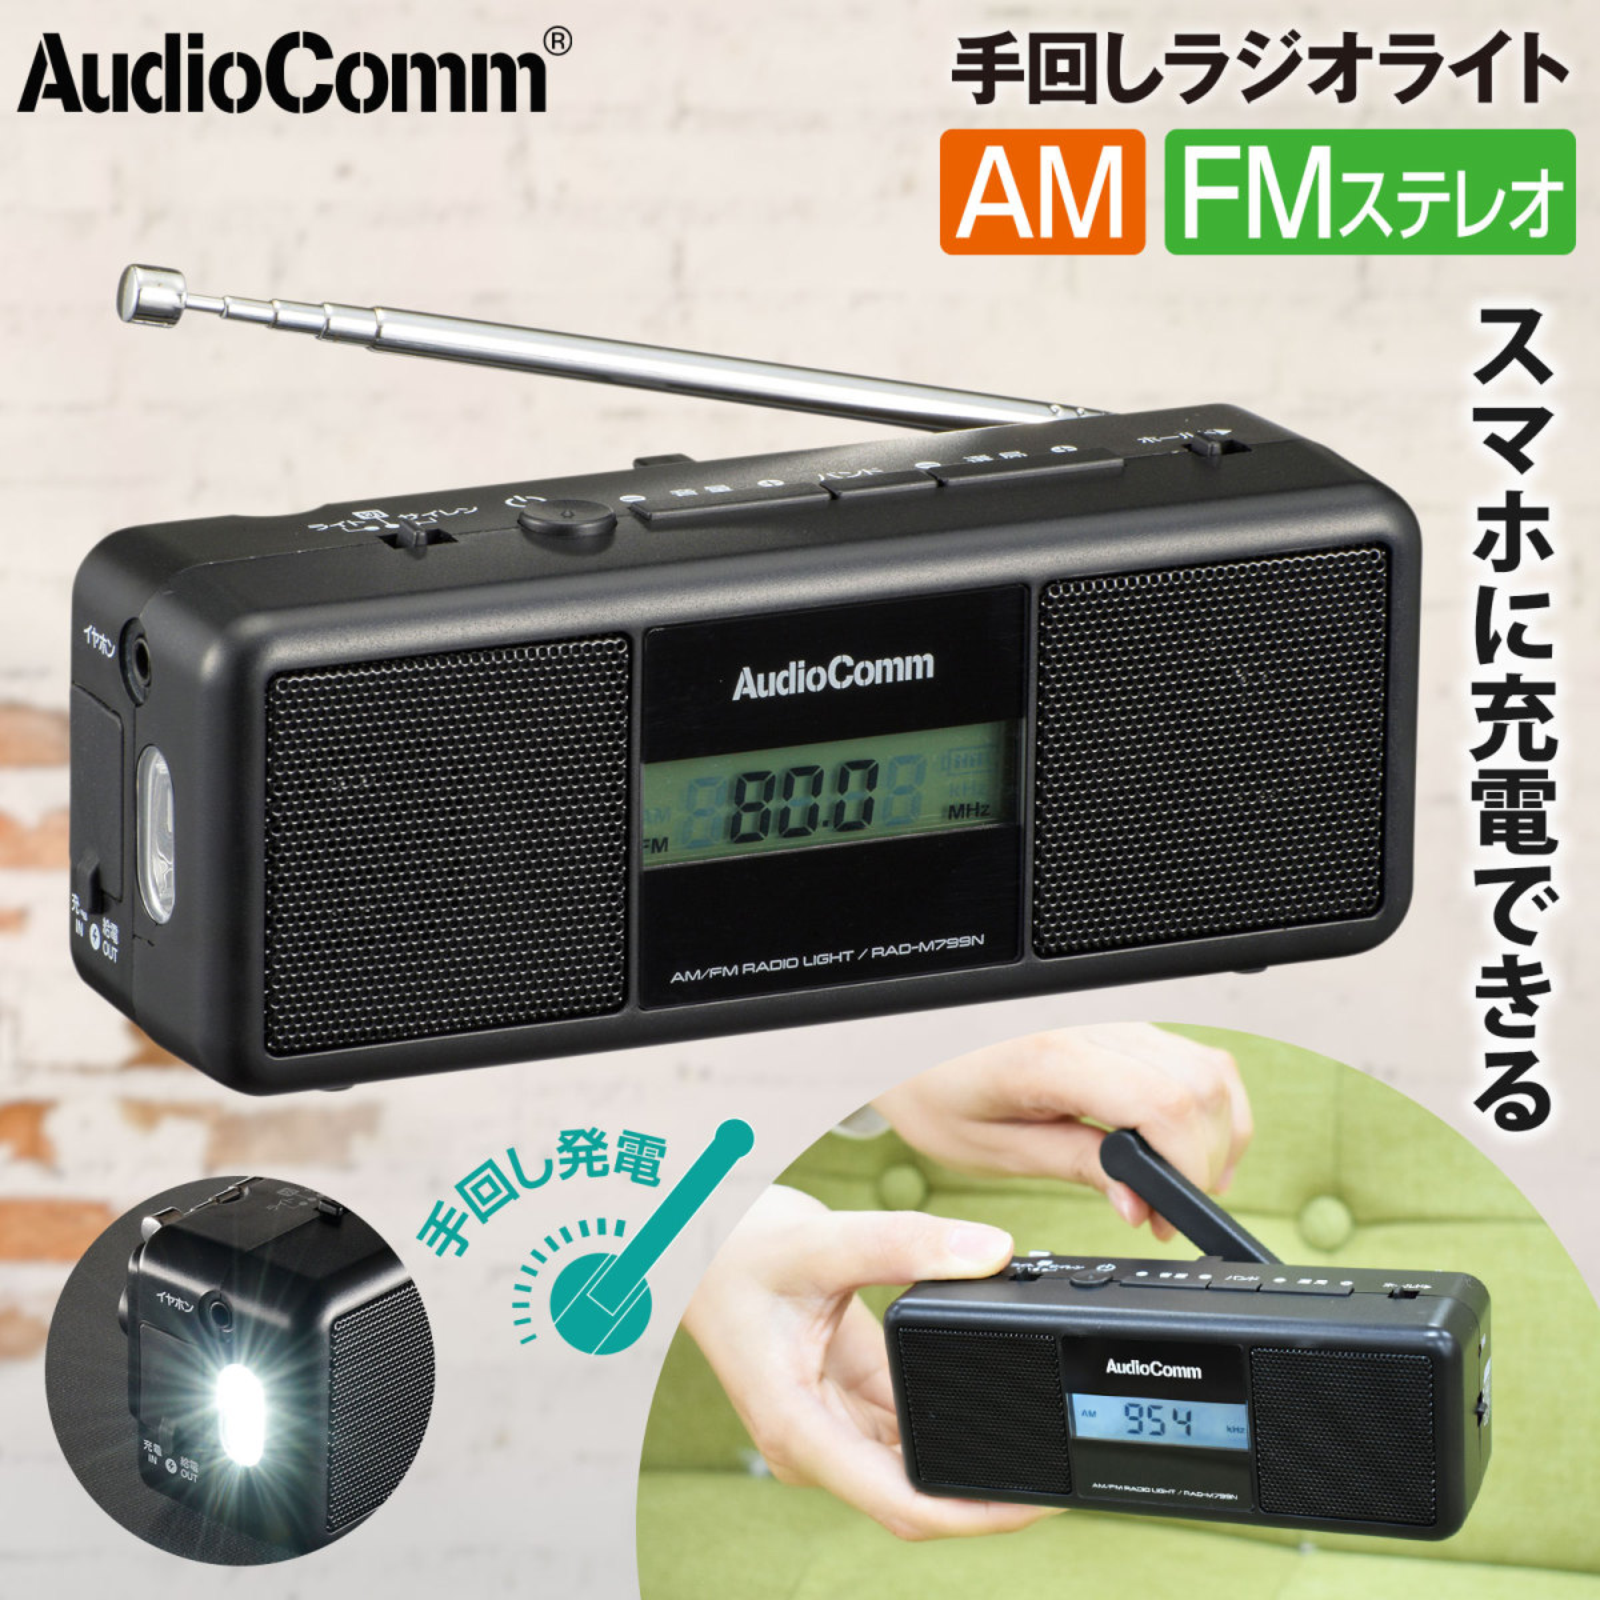 AudioComm 手回しラジオライト RAD-M799N 07-3799 OHM オーム電機